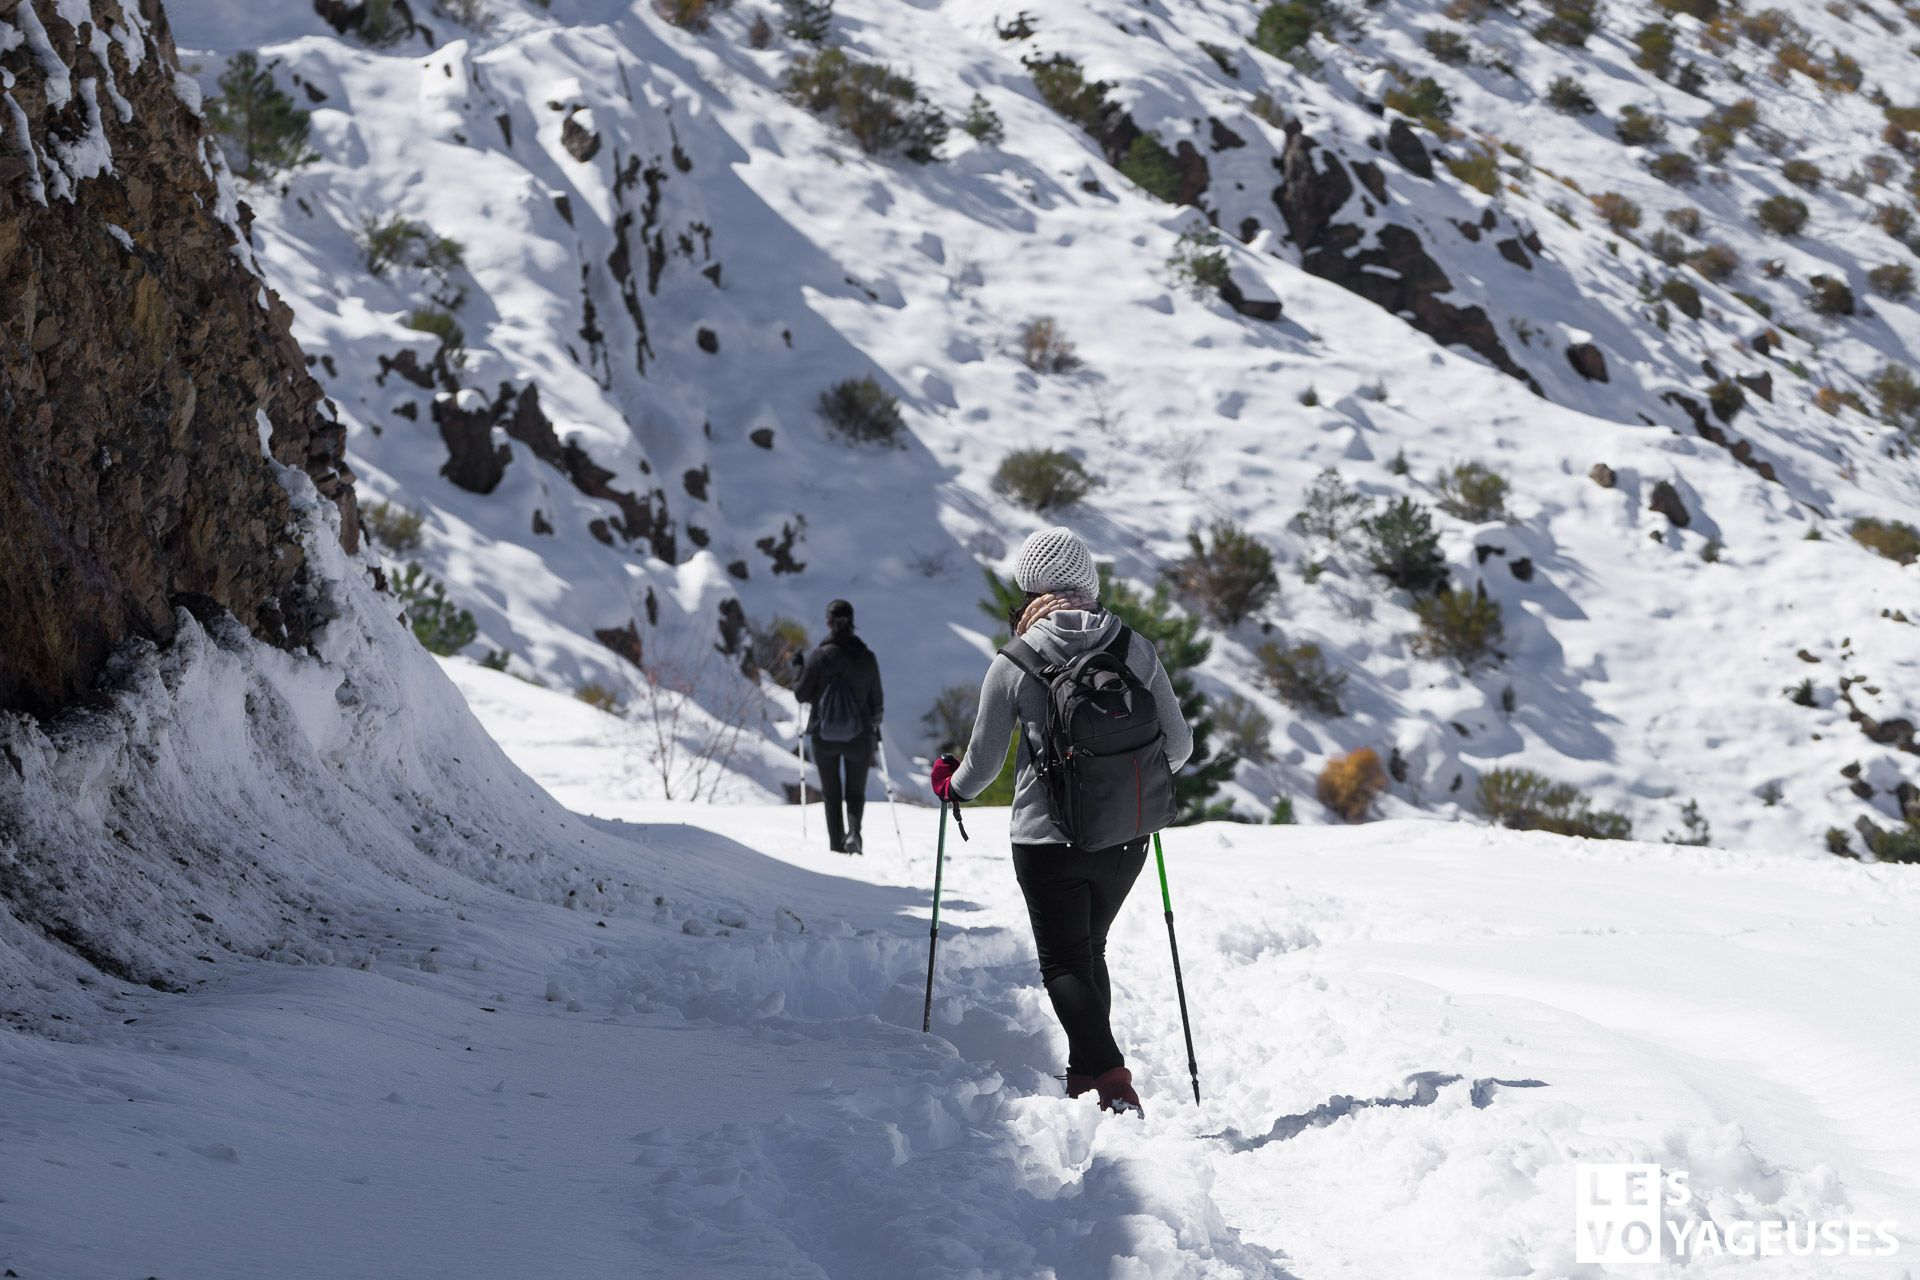 Les-voyageuses-maroc-imlil-hiver-00006